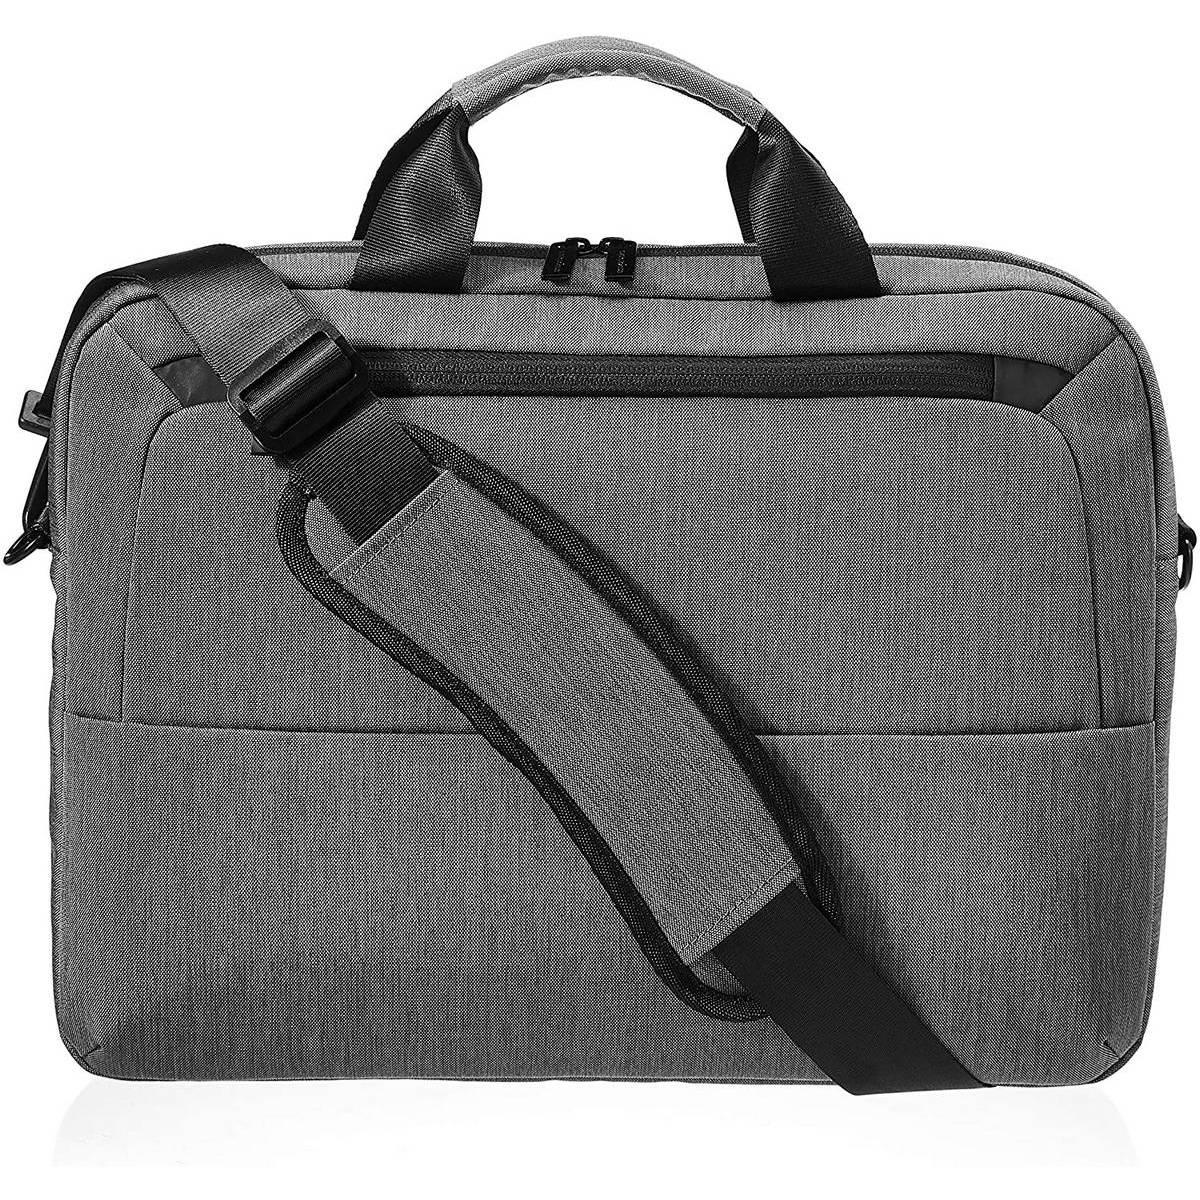 "EMPIRON Laptop Bag , Repellent Shoulder Messenger Bag Durable Office Bag, Business Briefcase for Men Women, Carry On Handle Case for Up to 17"" Laptop/Notebook/MacBook ELBF01"